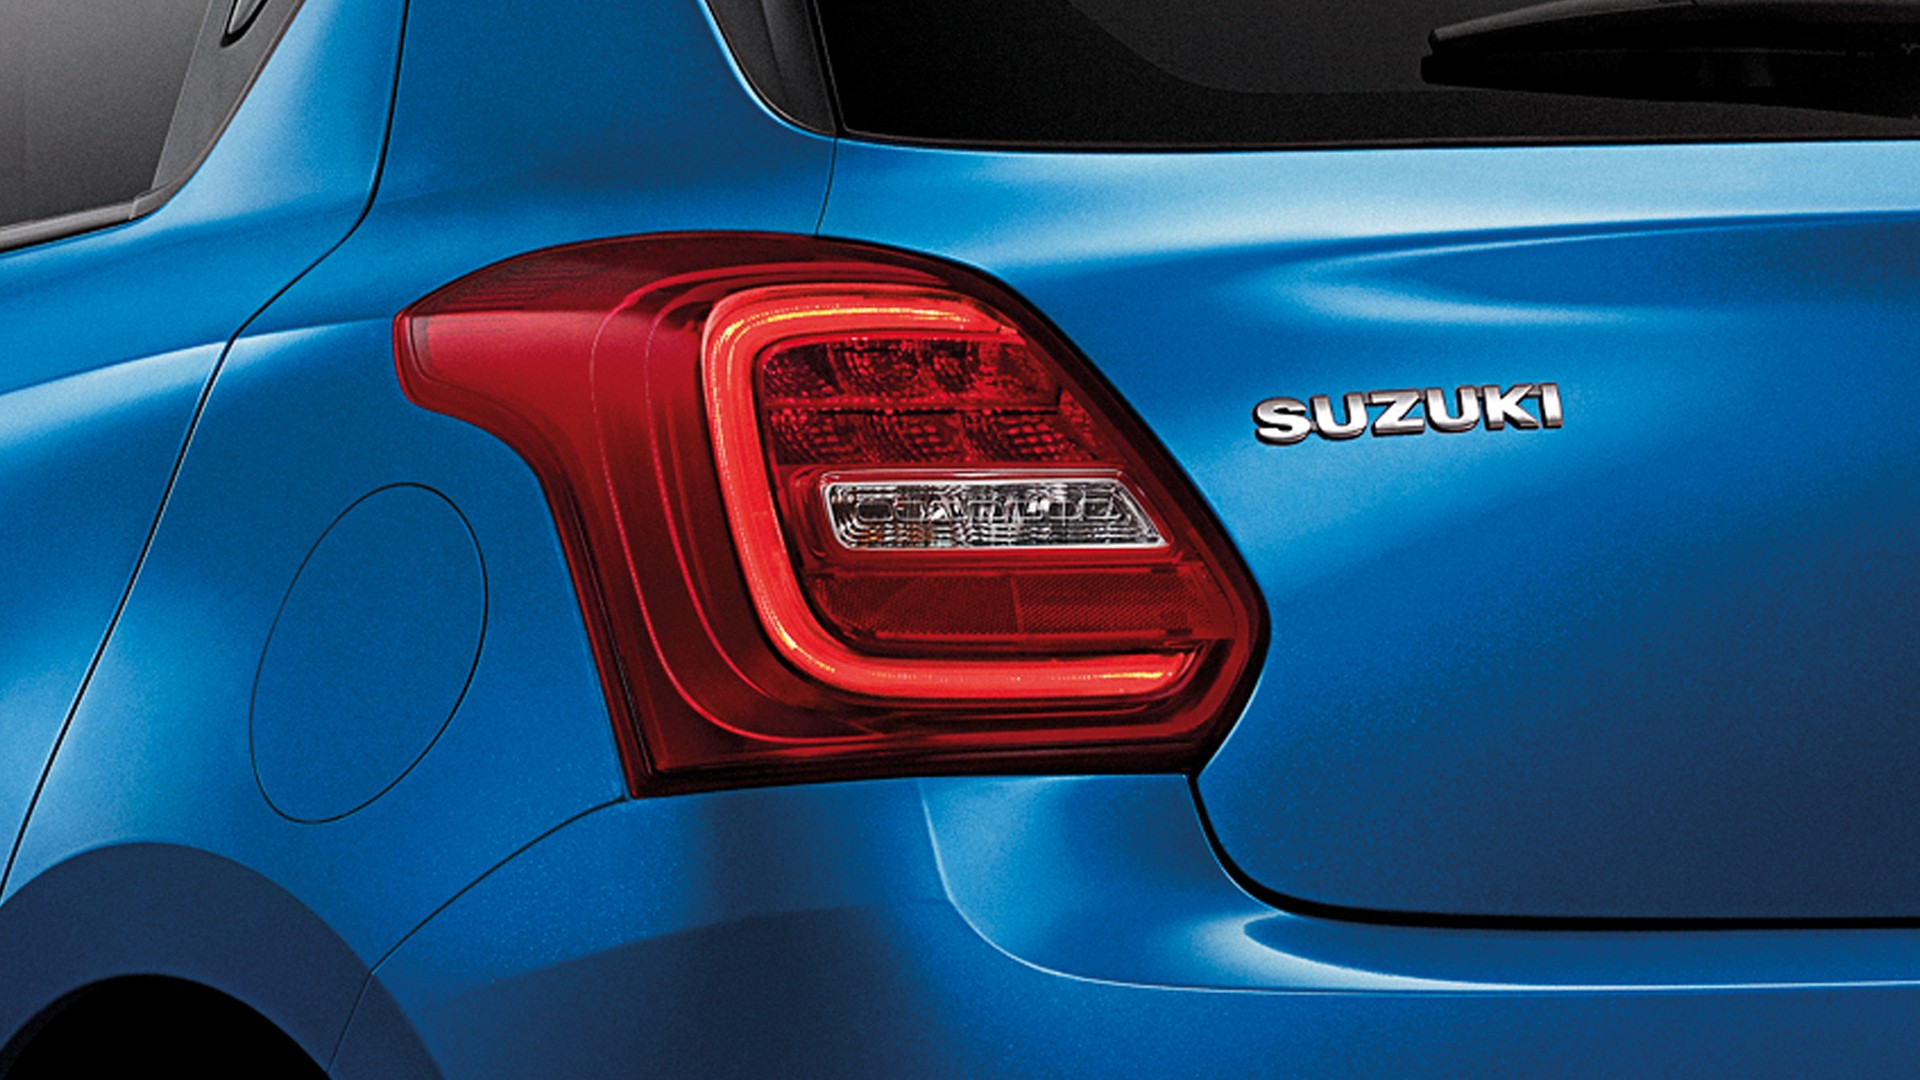 New Suzuki Swift ไฟท้าย LED